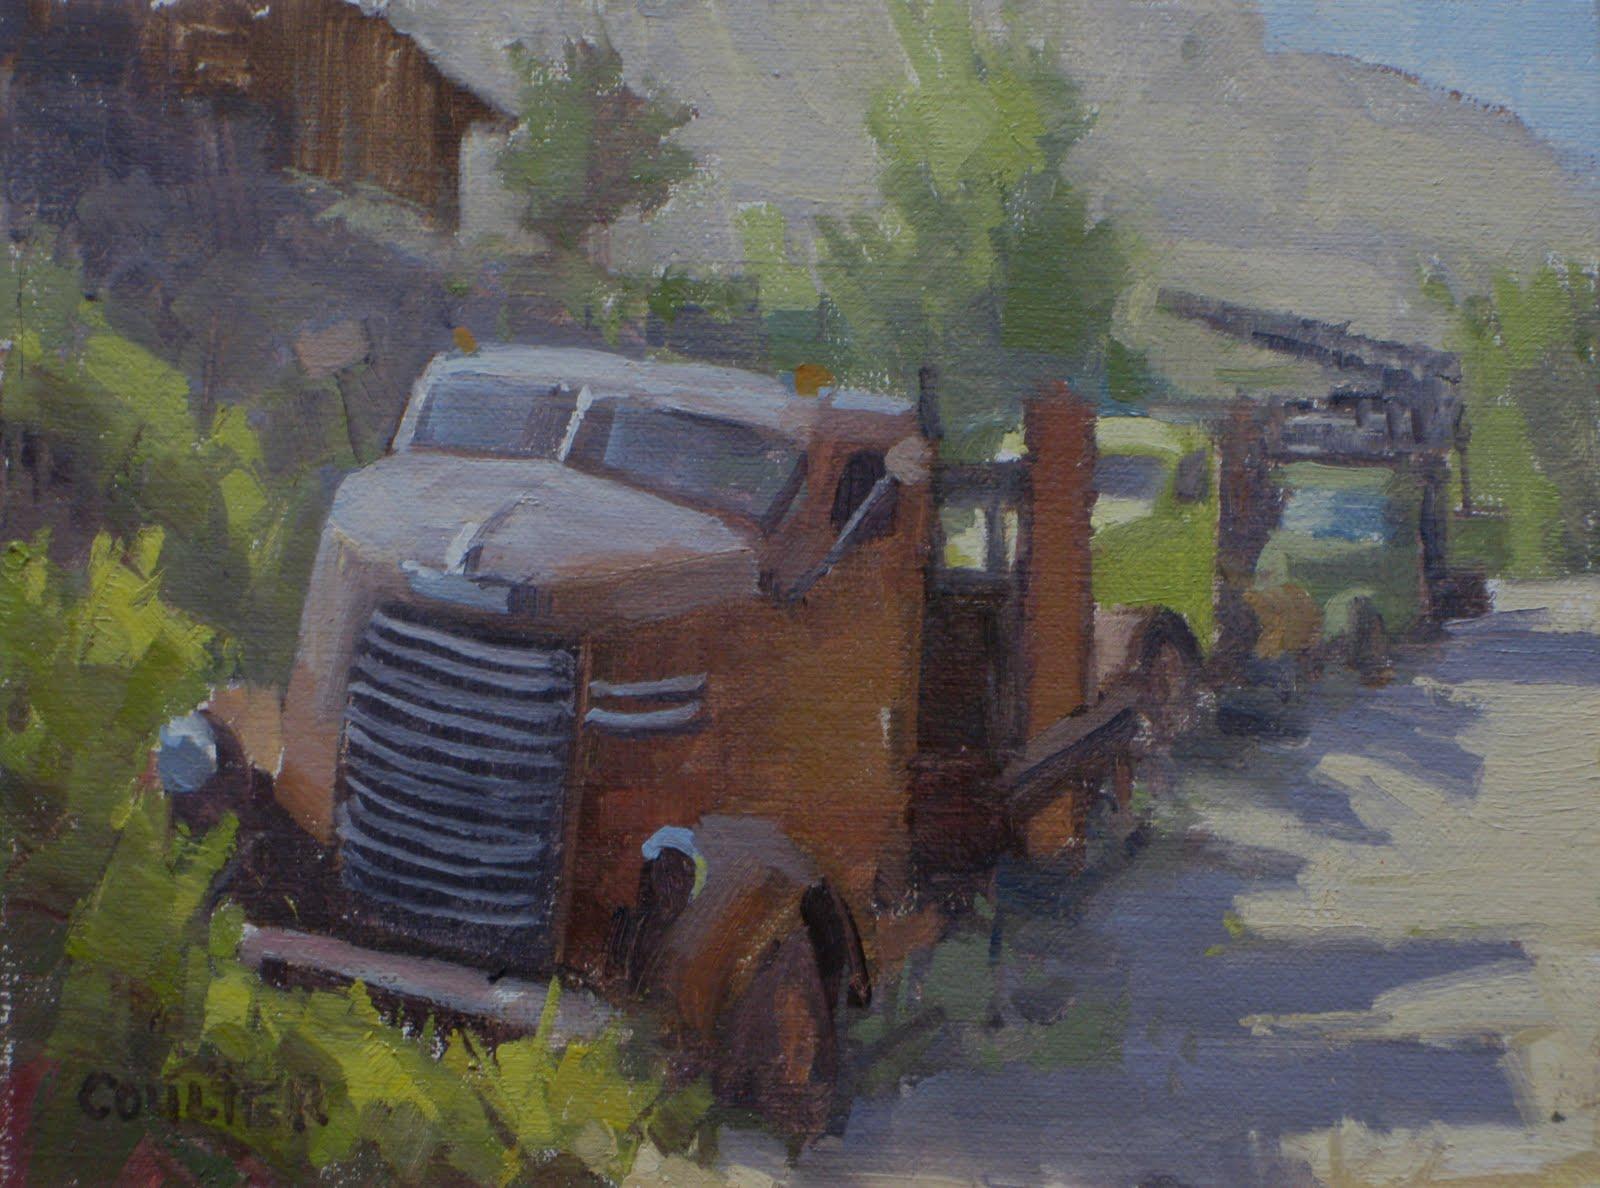 """SNUB NOSE DODGE"" original fine art by James Coulter"